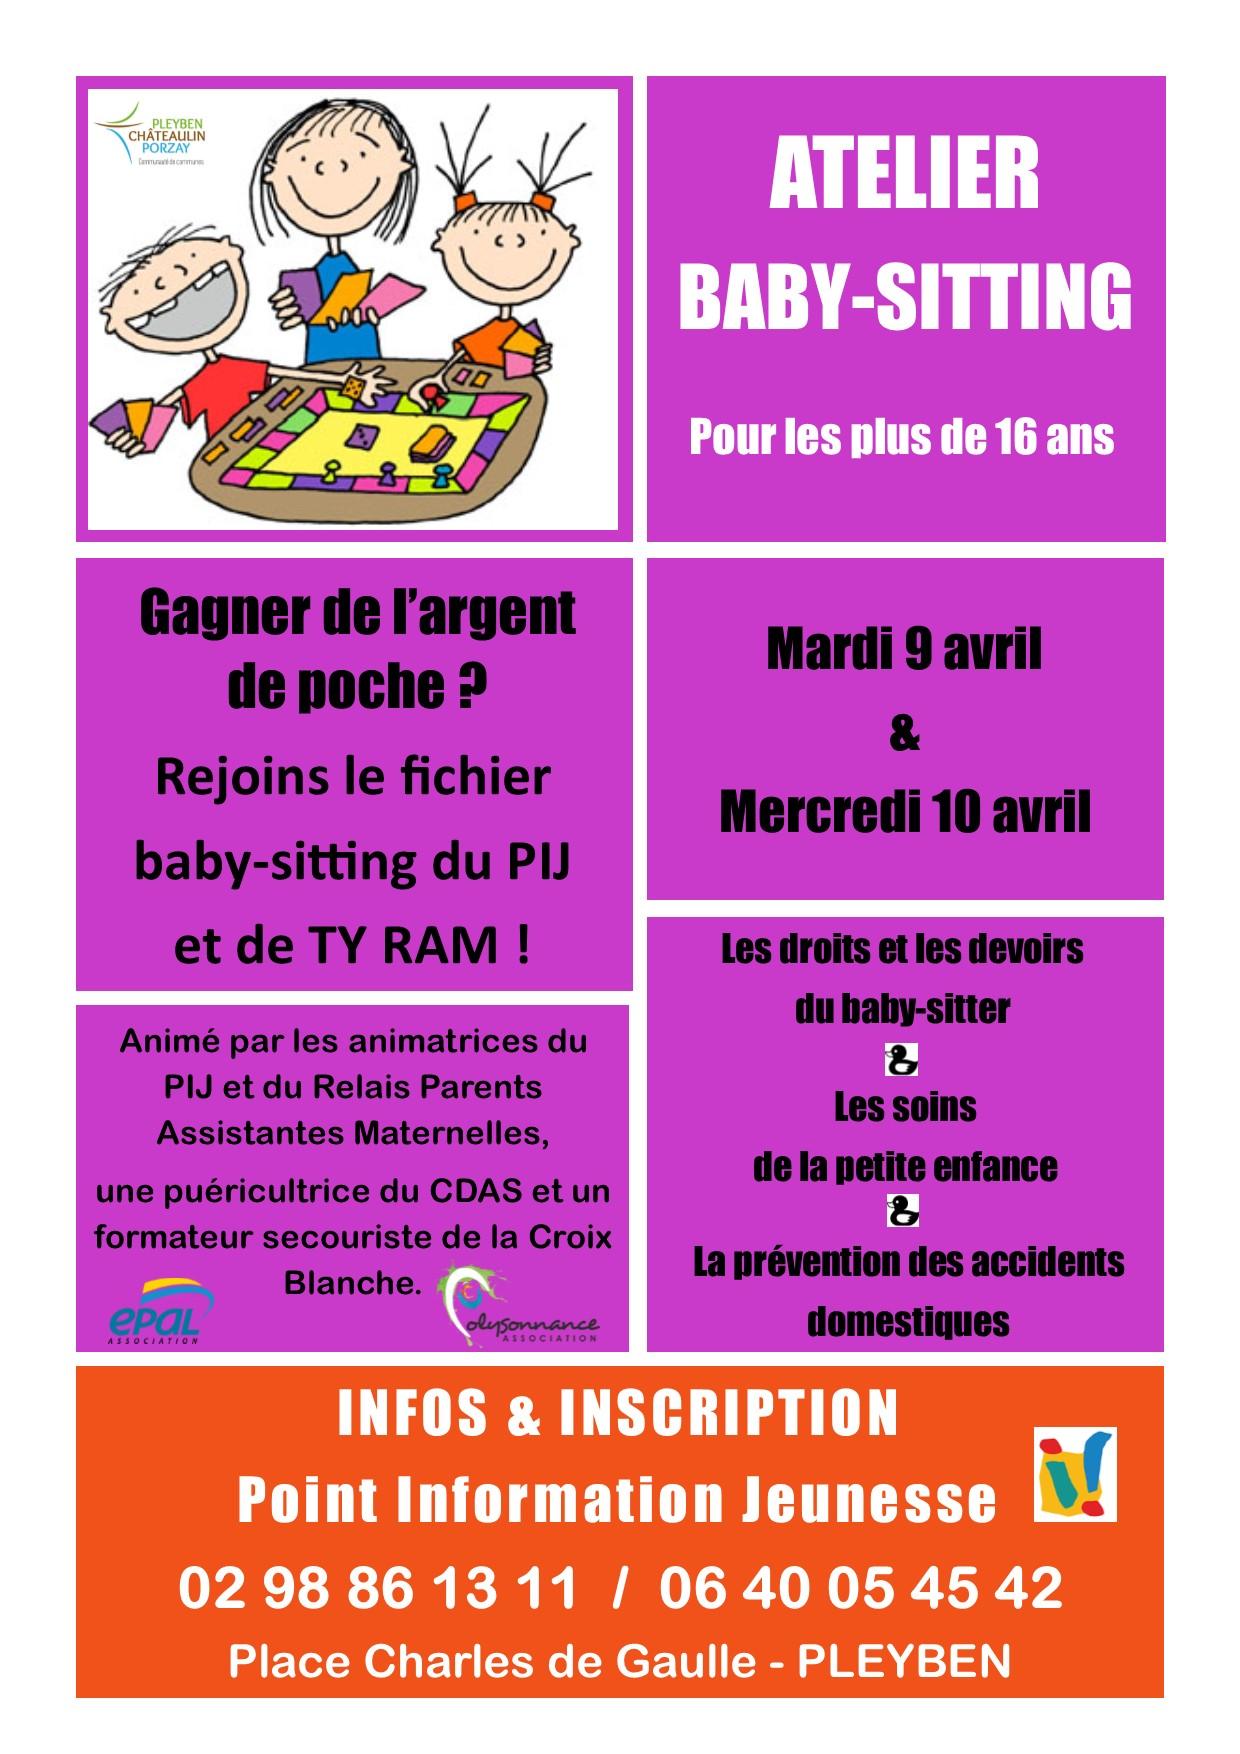 PIJ : ATELIER BABY-SITTING : MARDI 9 AVRIL et MERCREDI 10 AVRIL à PLEYBEN